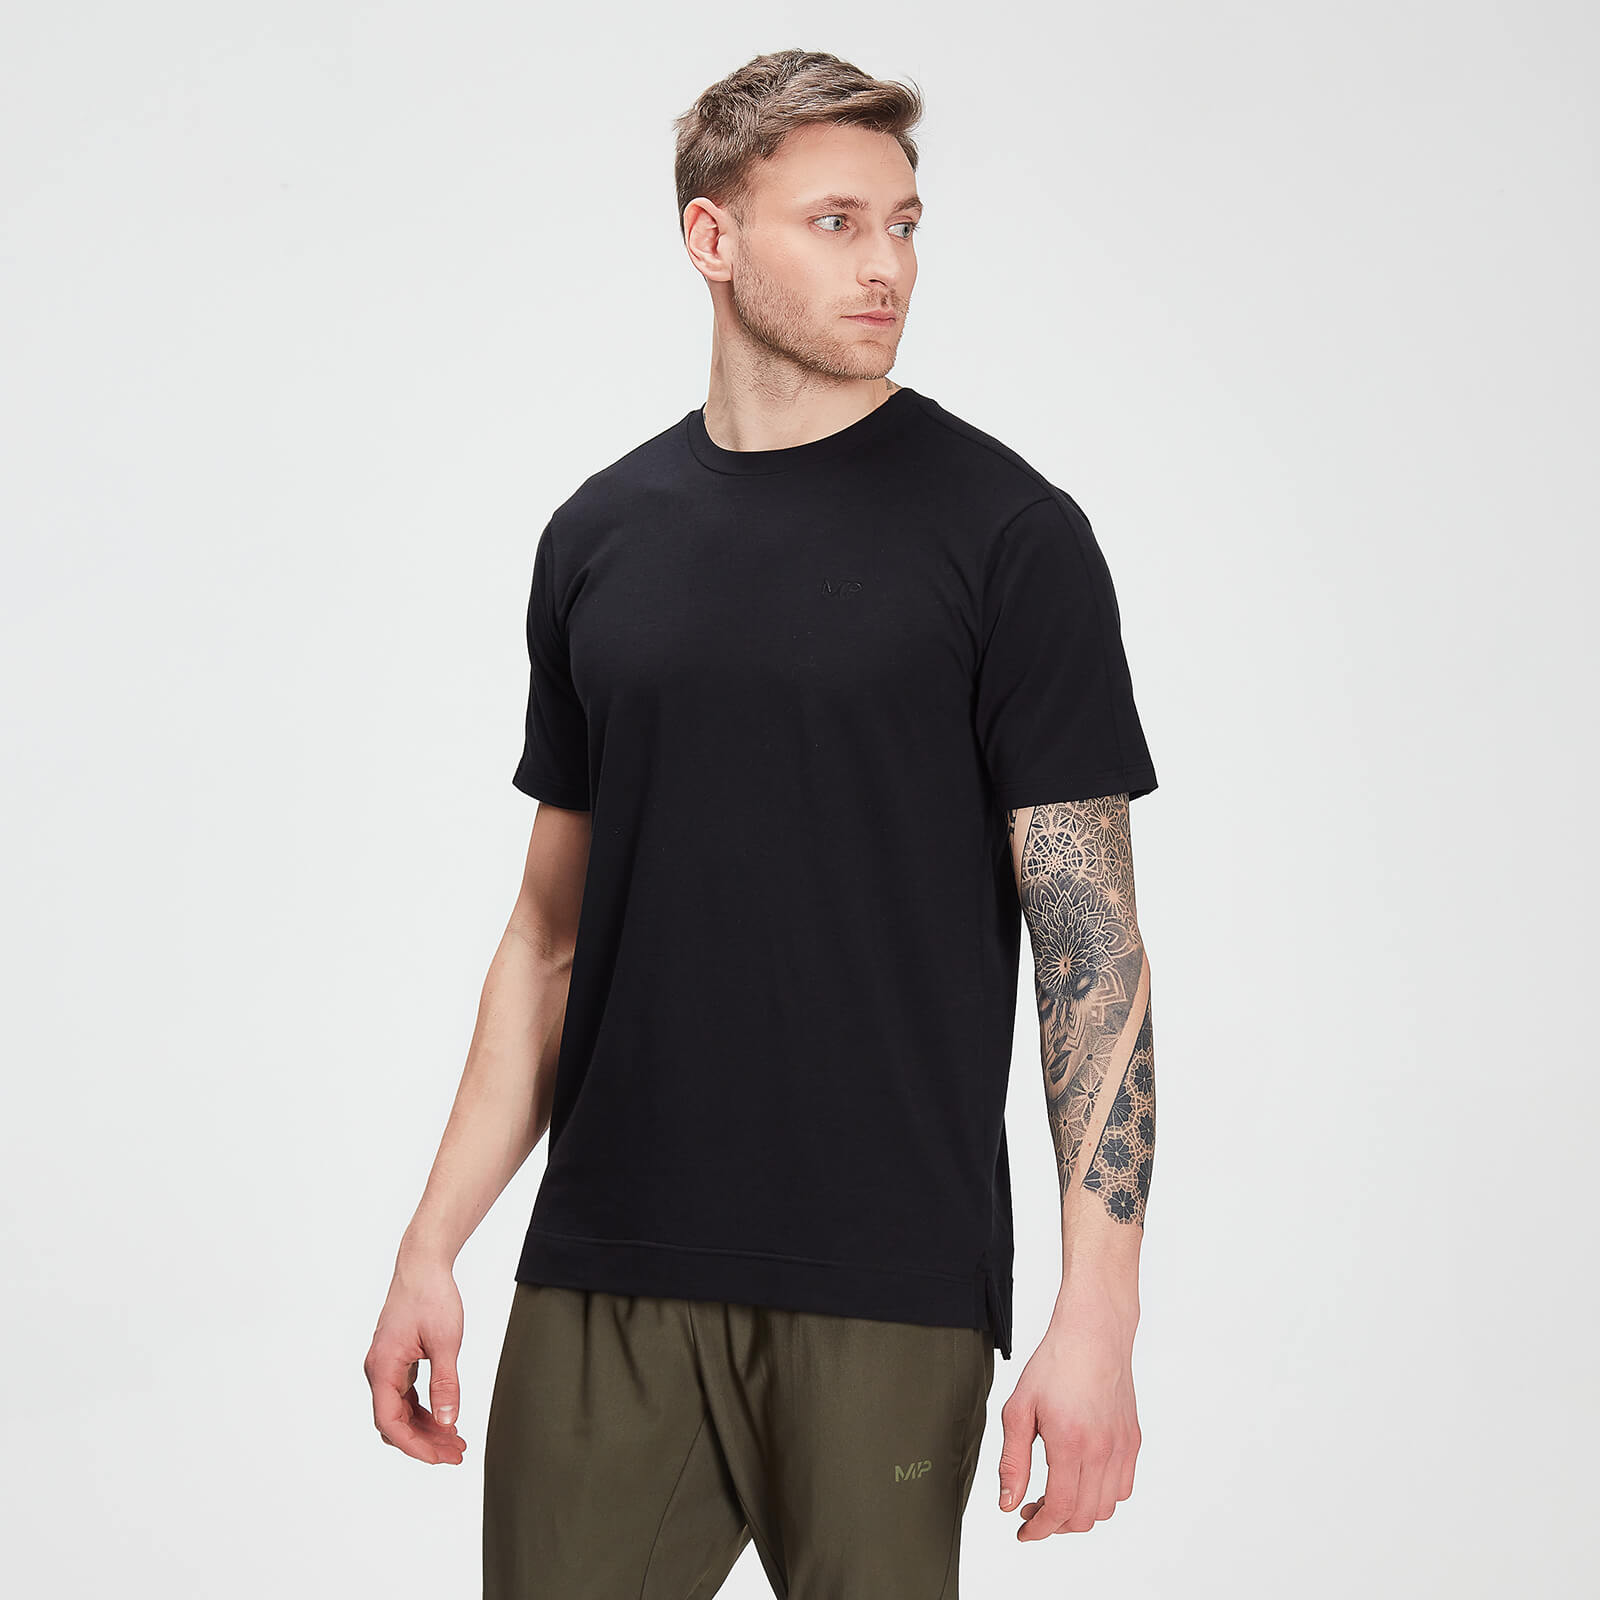 Купить MP Men's Raw Training drirelease® Short Sleeve T-Shirt - Black - XL, Myprotein International